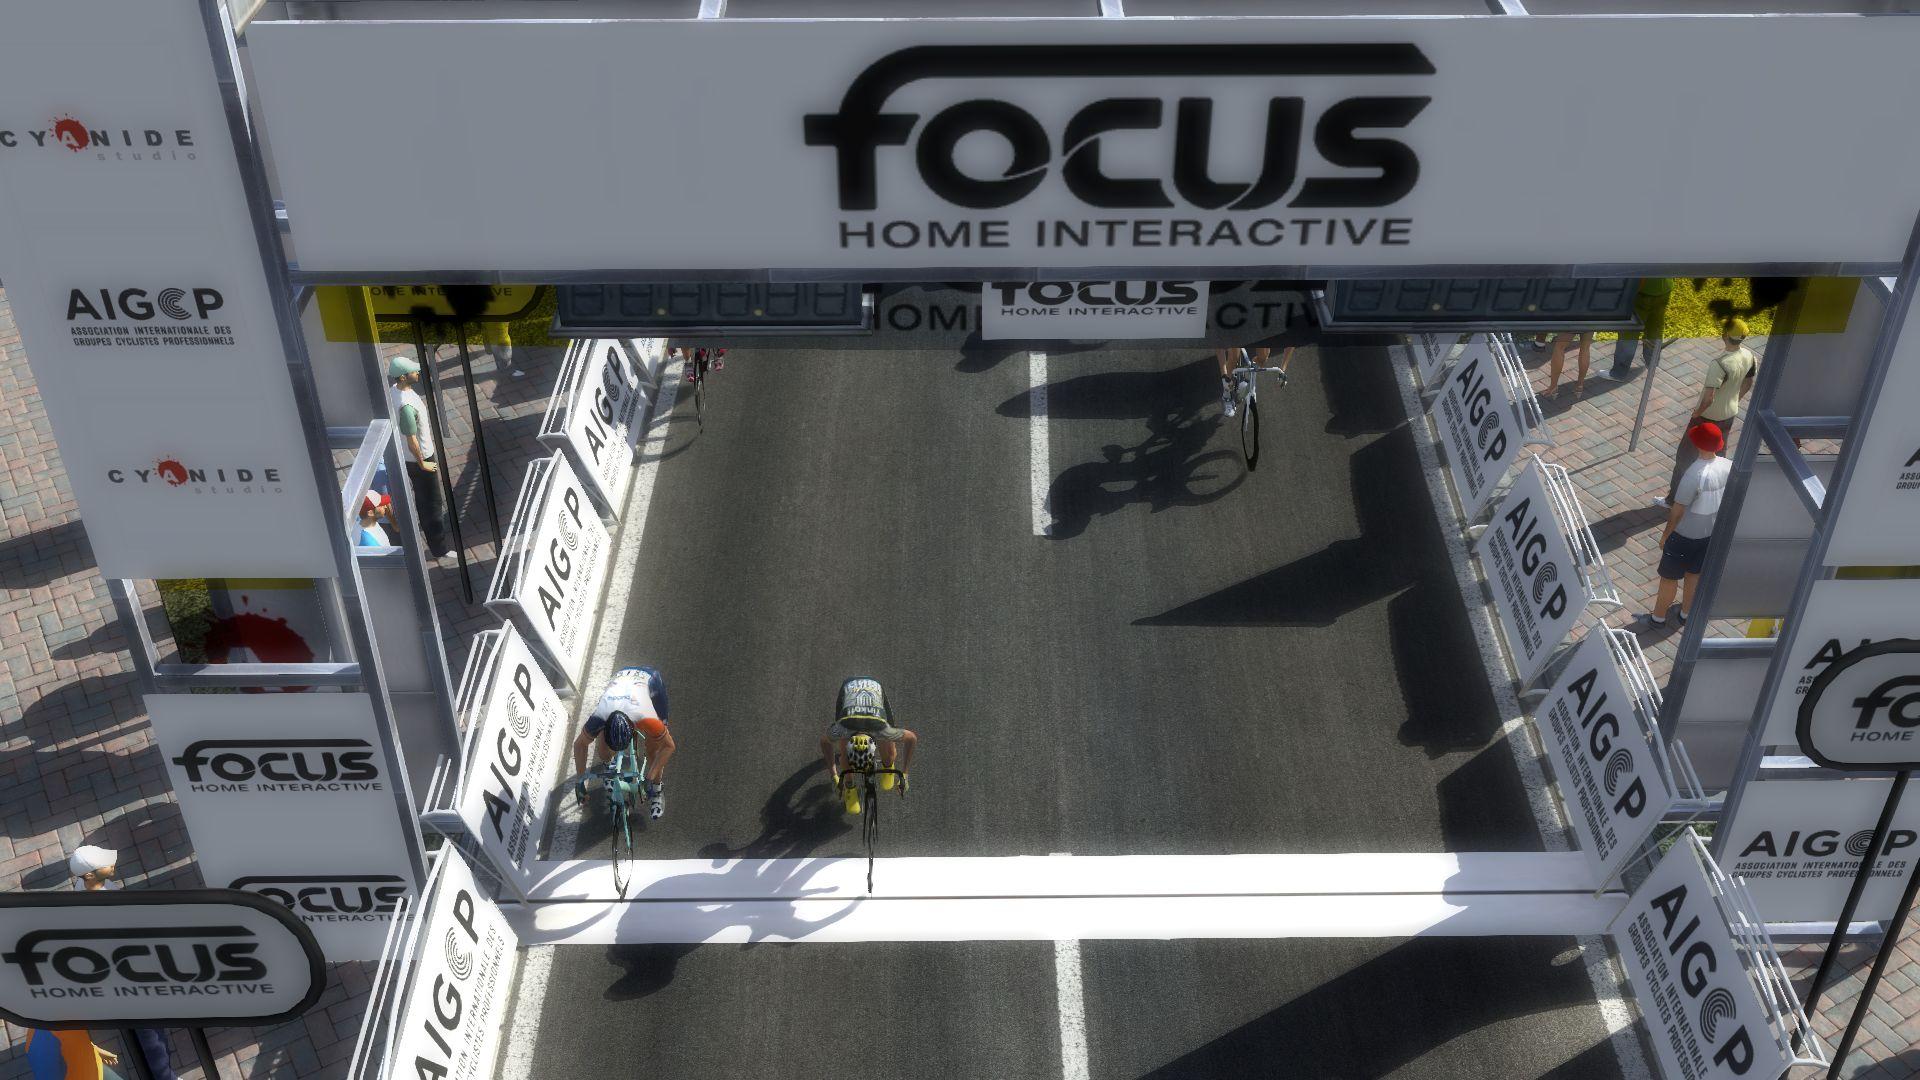 pcmdaily.com/images/mg/2019/Races/PT/Tirreno/mg19_ta_s07_27.jpg